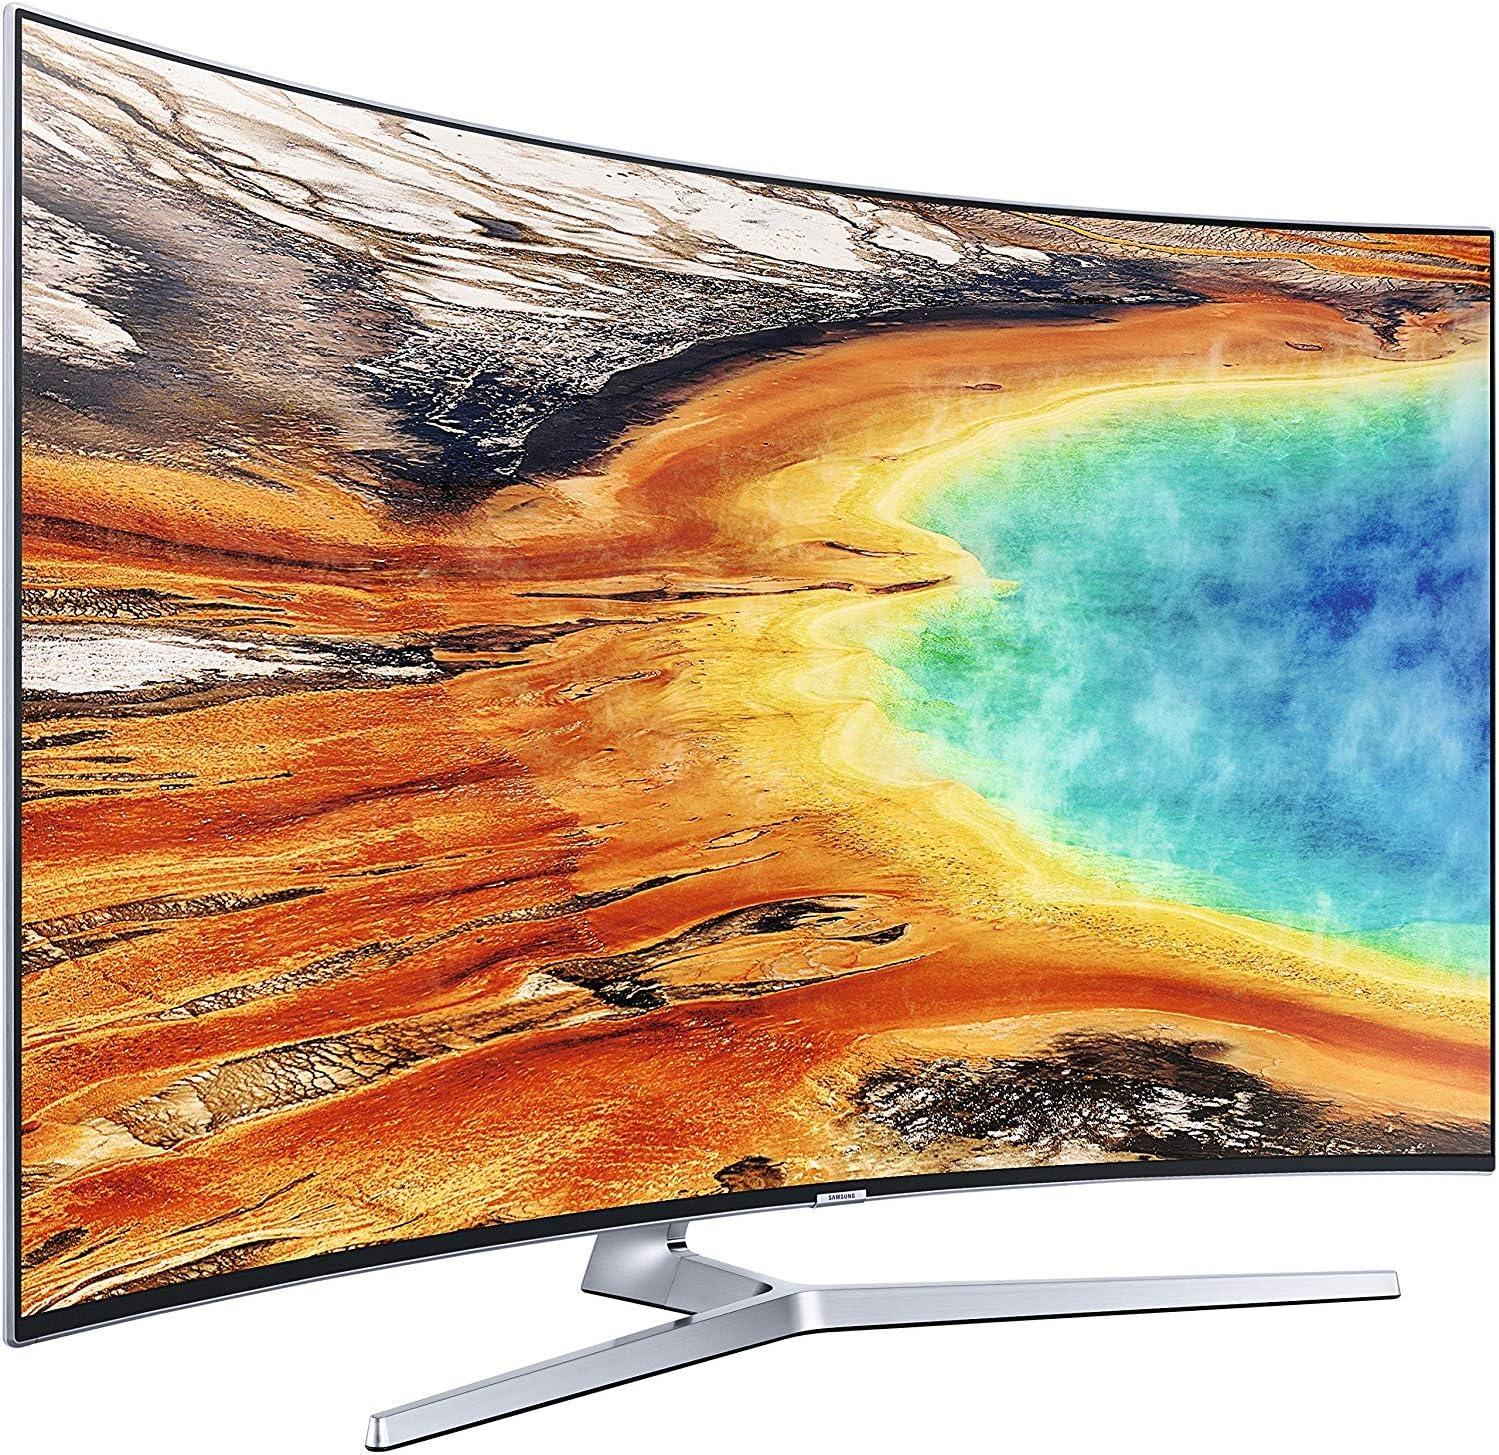 SAMSUNG TV led de 55 Pulgadas ue55mu9000txxu Ultra HD Inteligente Curvo uhd: Amazon.es: Electrónica